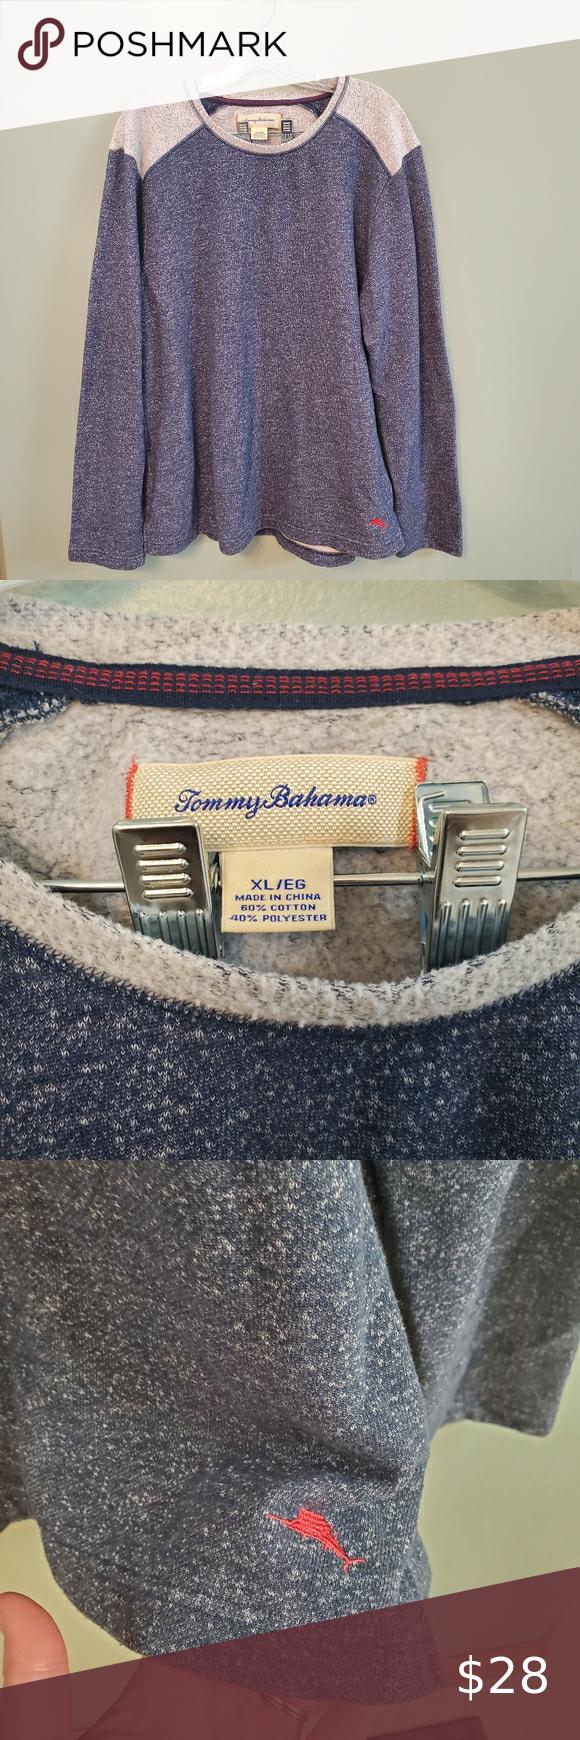 Tommy Bahama Sweatshirt Size Xlarge Tommy Bahama Mens Sweatshirt Great Condition No Flaws Blue And Gray Fast Tommy Bahama Shirts Tommy Bahama Tommy Bahama Mens [ 1740 x 580 Pixel ]